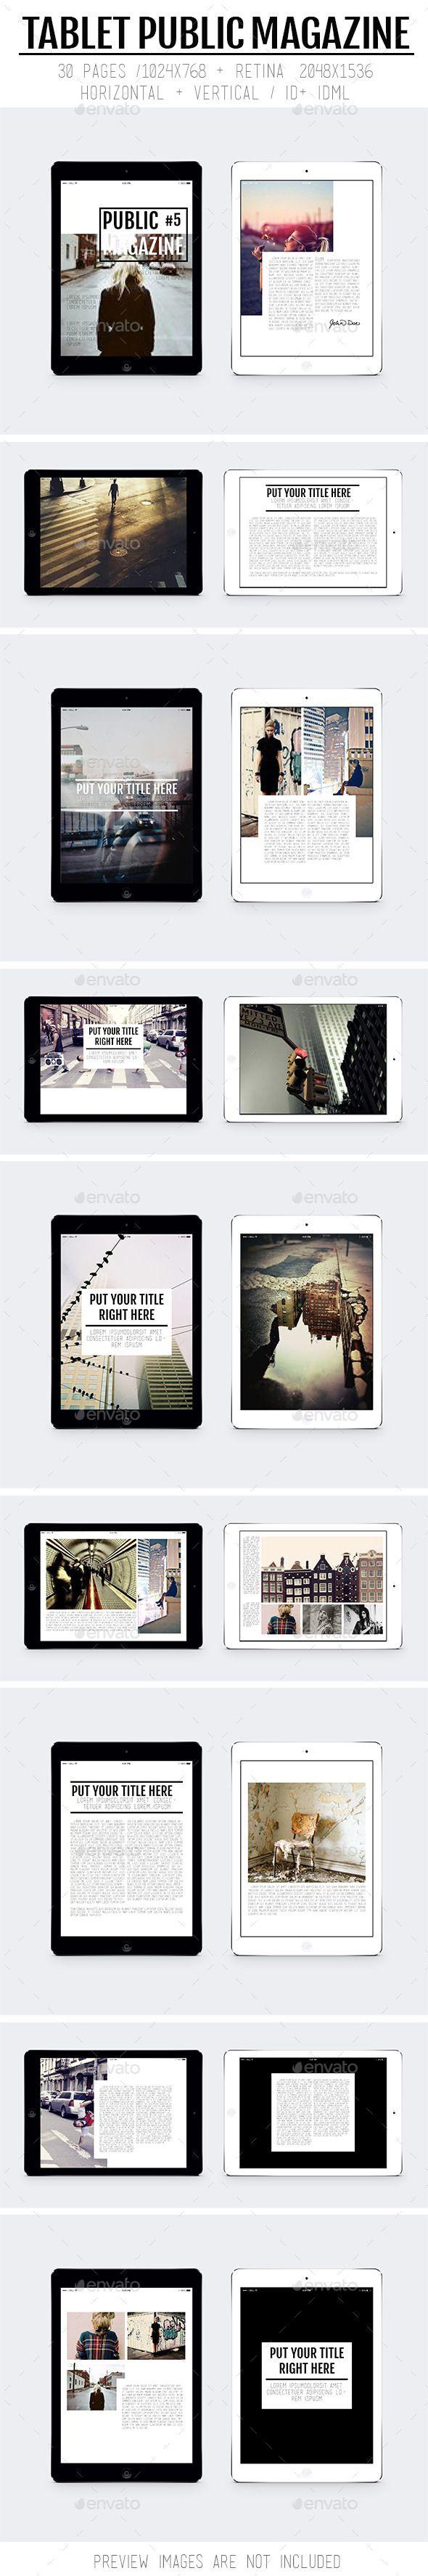 Tablet Public Magazine Template #design Download: http://graphicriver.net/item/tablet-public-magazine/9870326?ref=ksioks